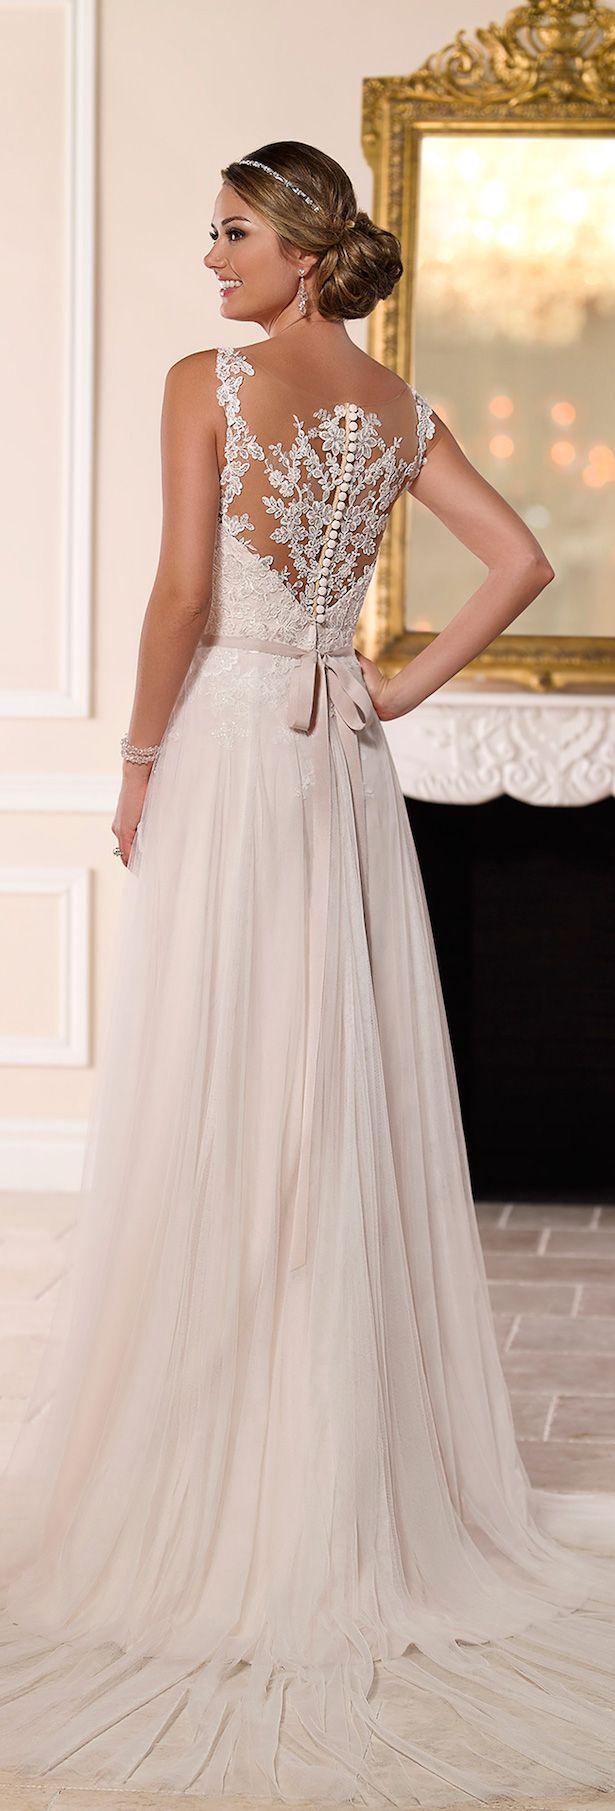 Stella York - Diva estilista...